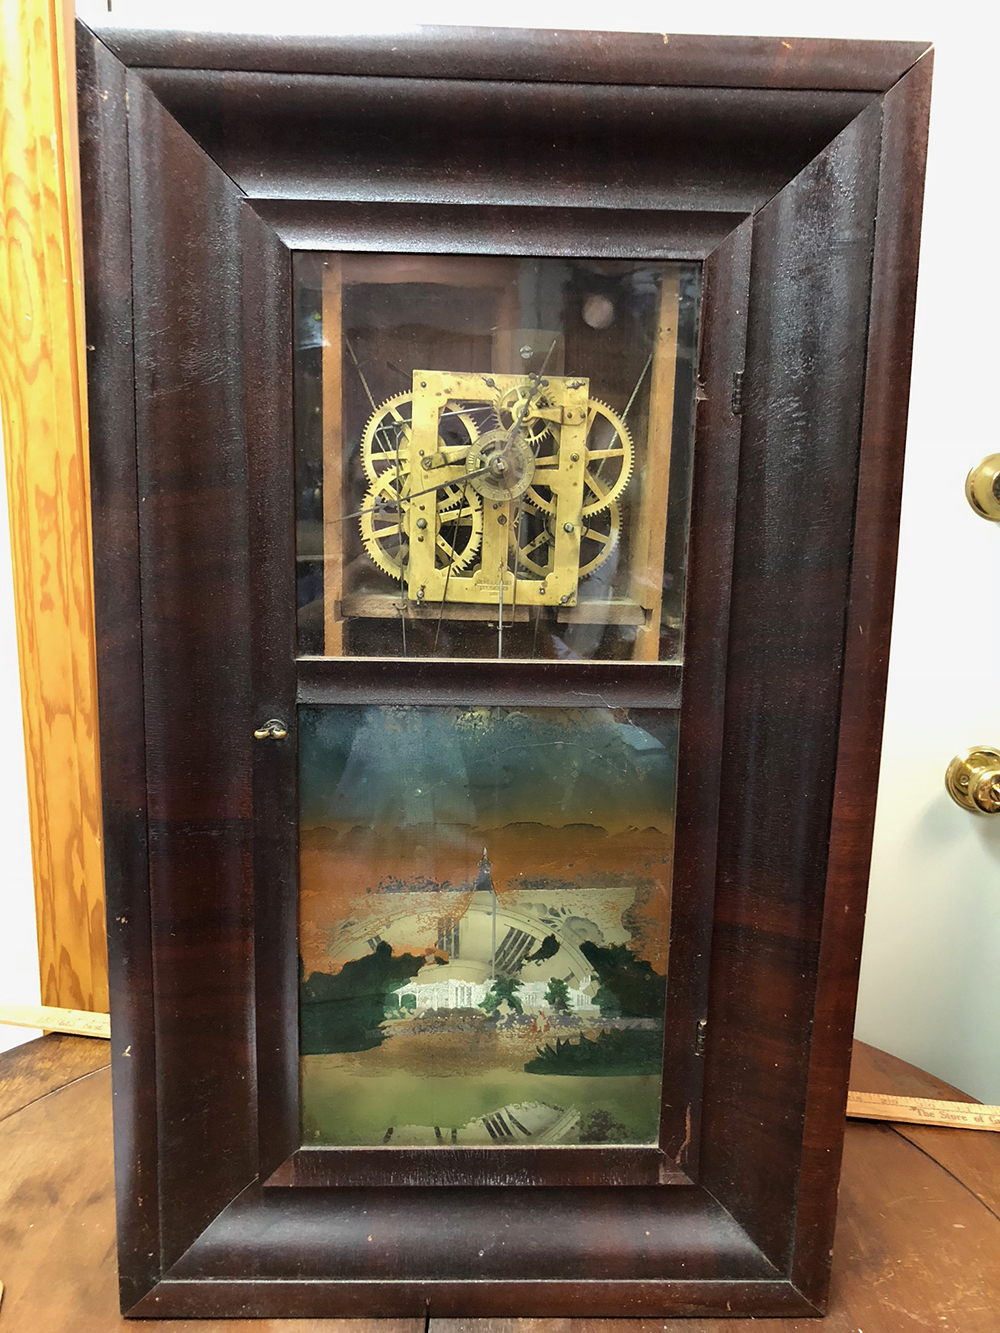 Waterbury Clock Co. OG Clock